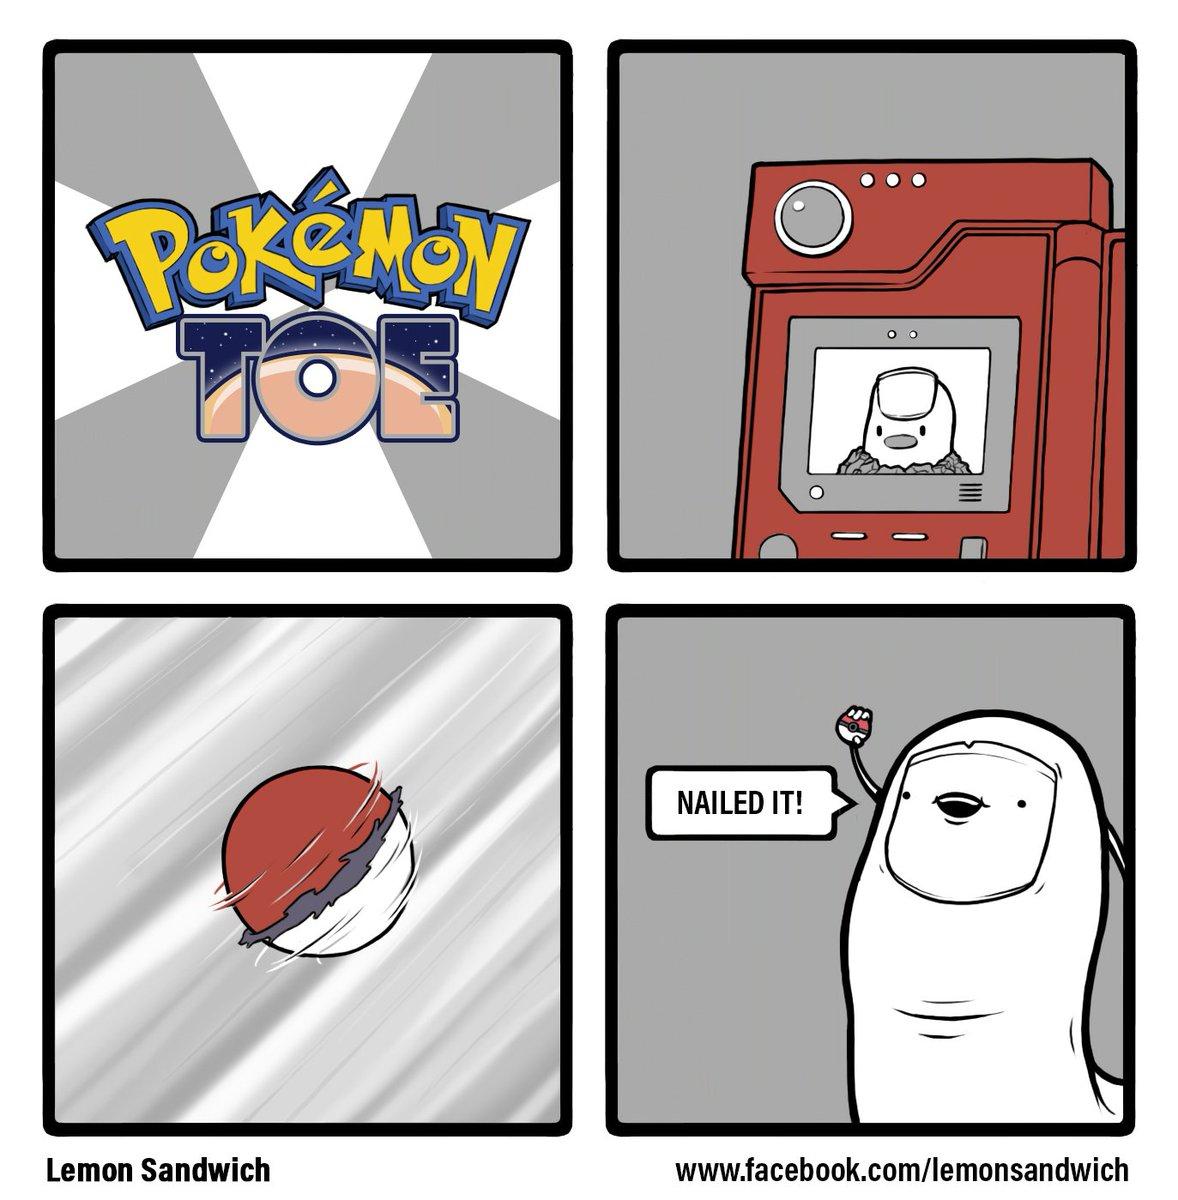 lemon sandwich on twitter pokemon toe pokemon pokemongo comic